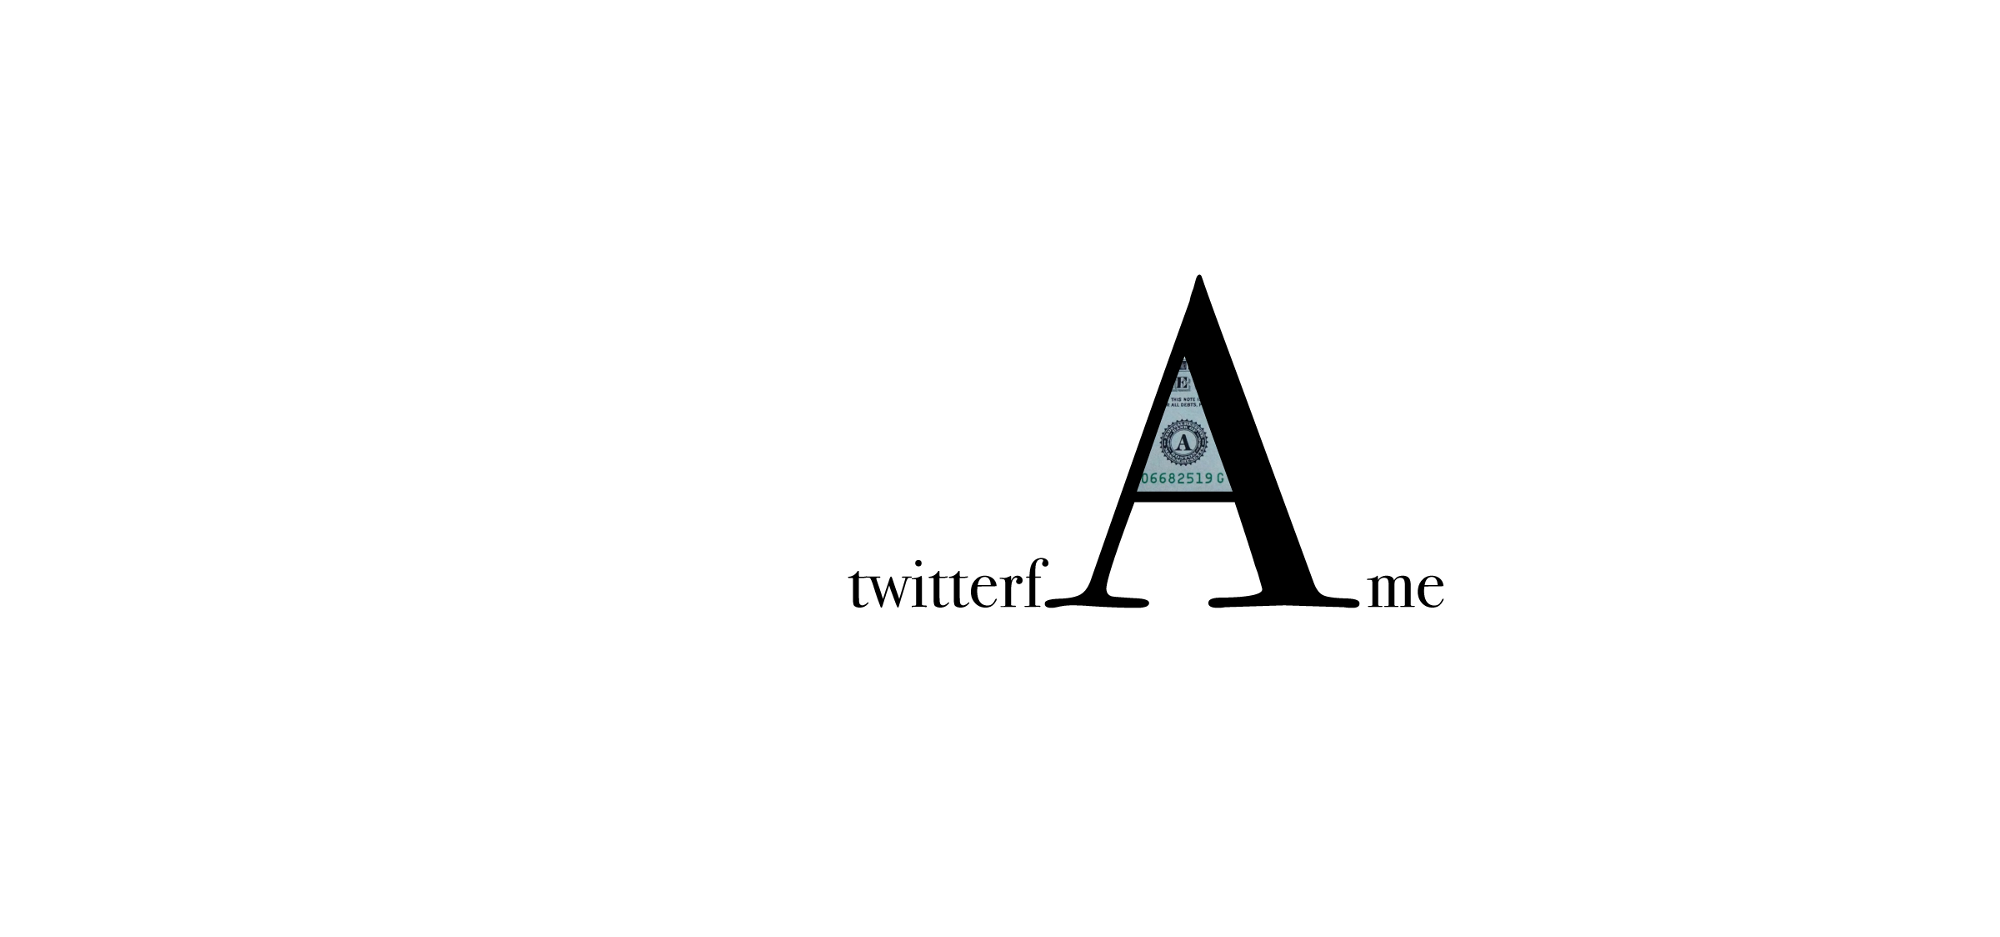 Pilcrow Twitterfame